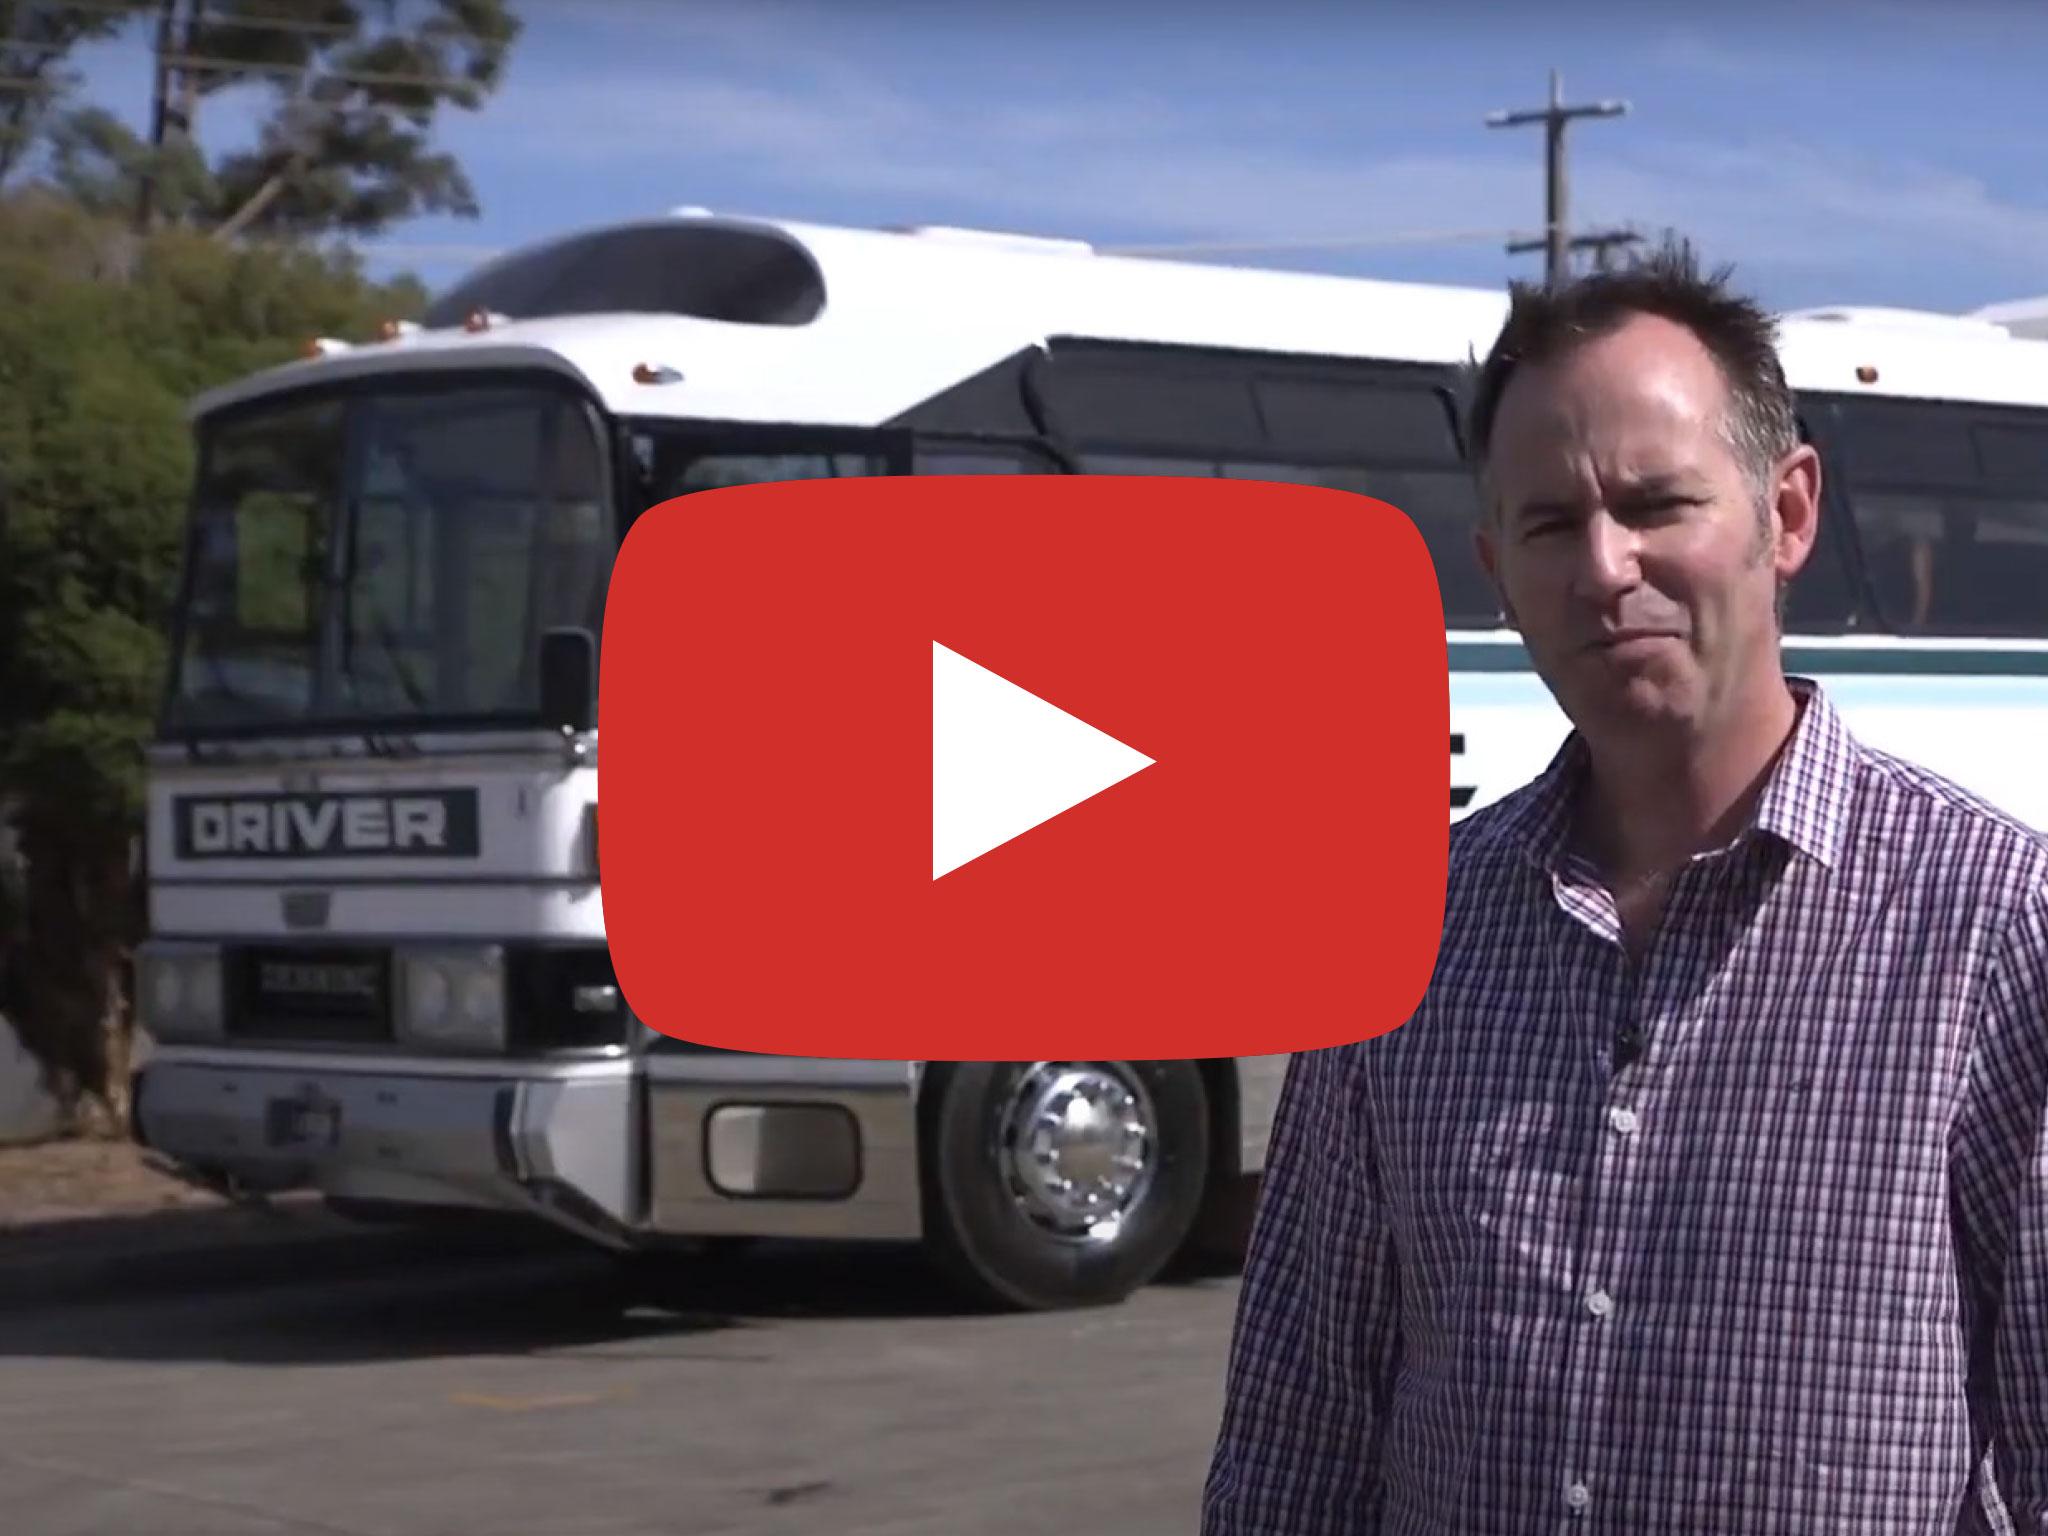 Denning DenAir Mono Bus, 1983 version, Review by Australian Bus and Coach at Hastings Vic, Video originally published May 2019.